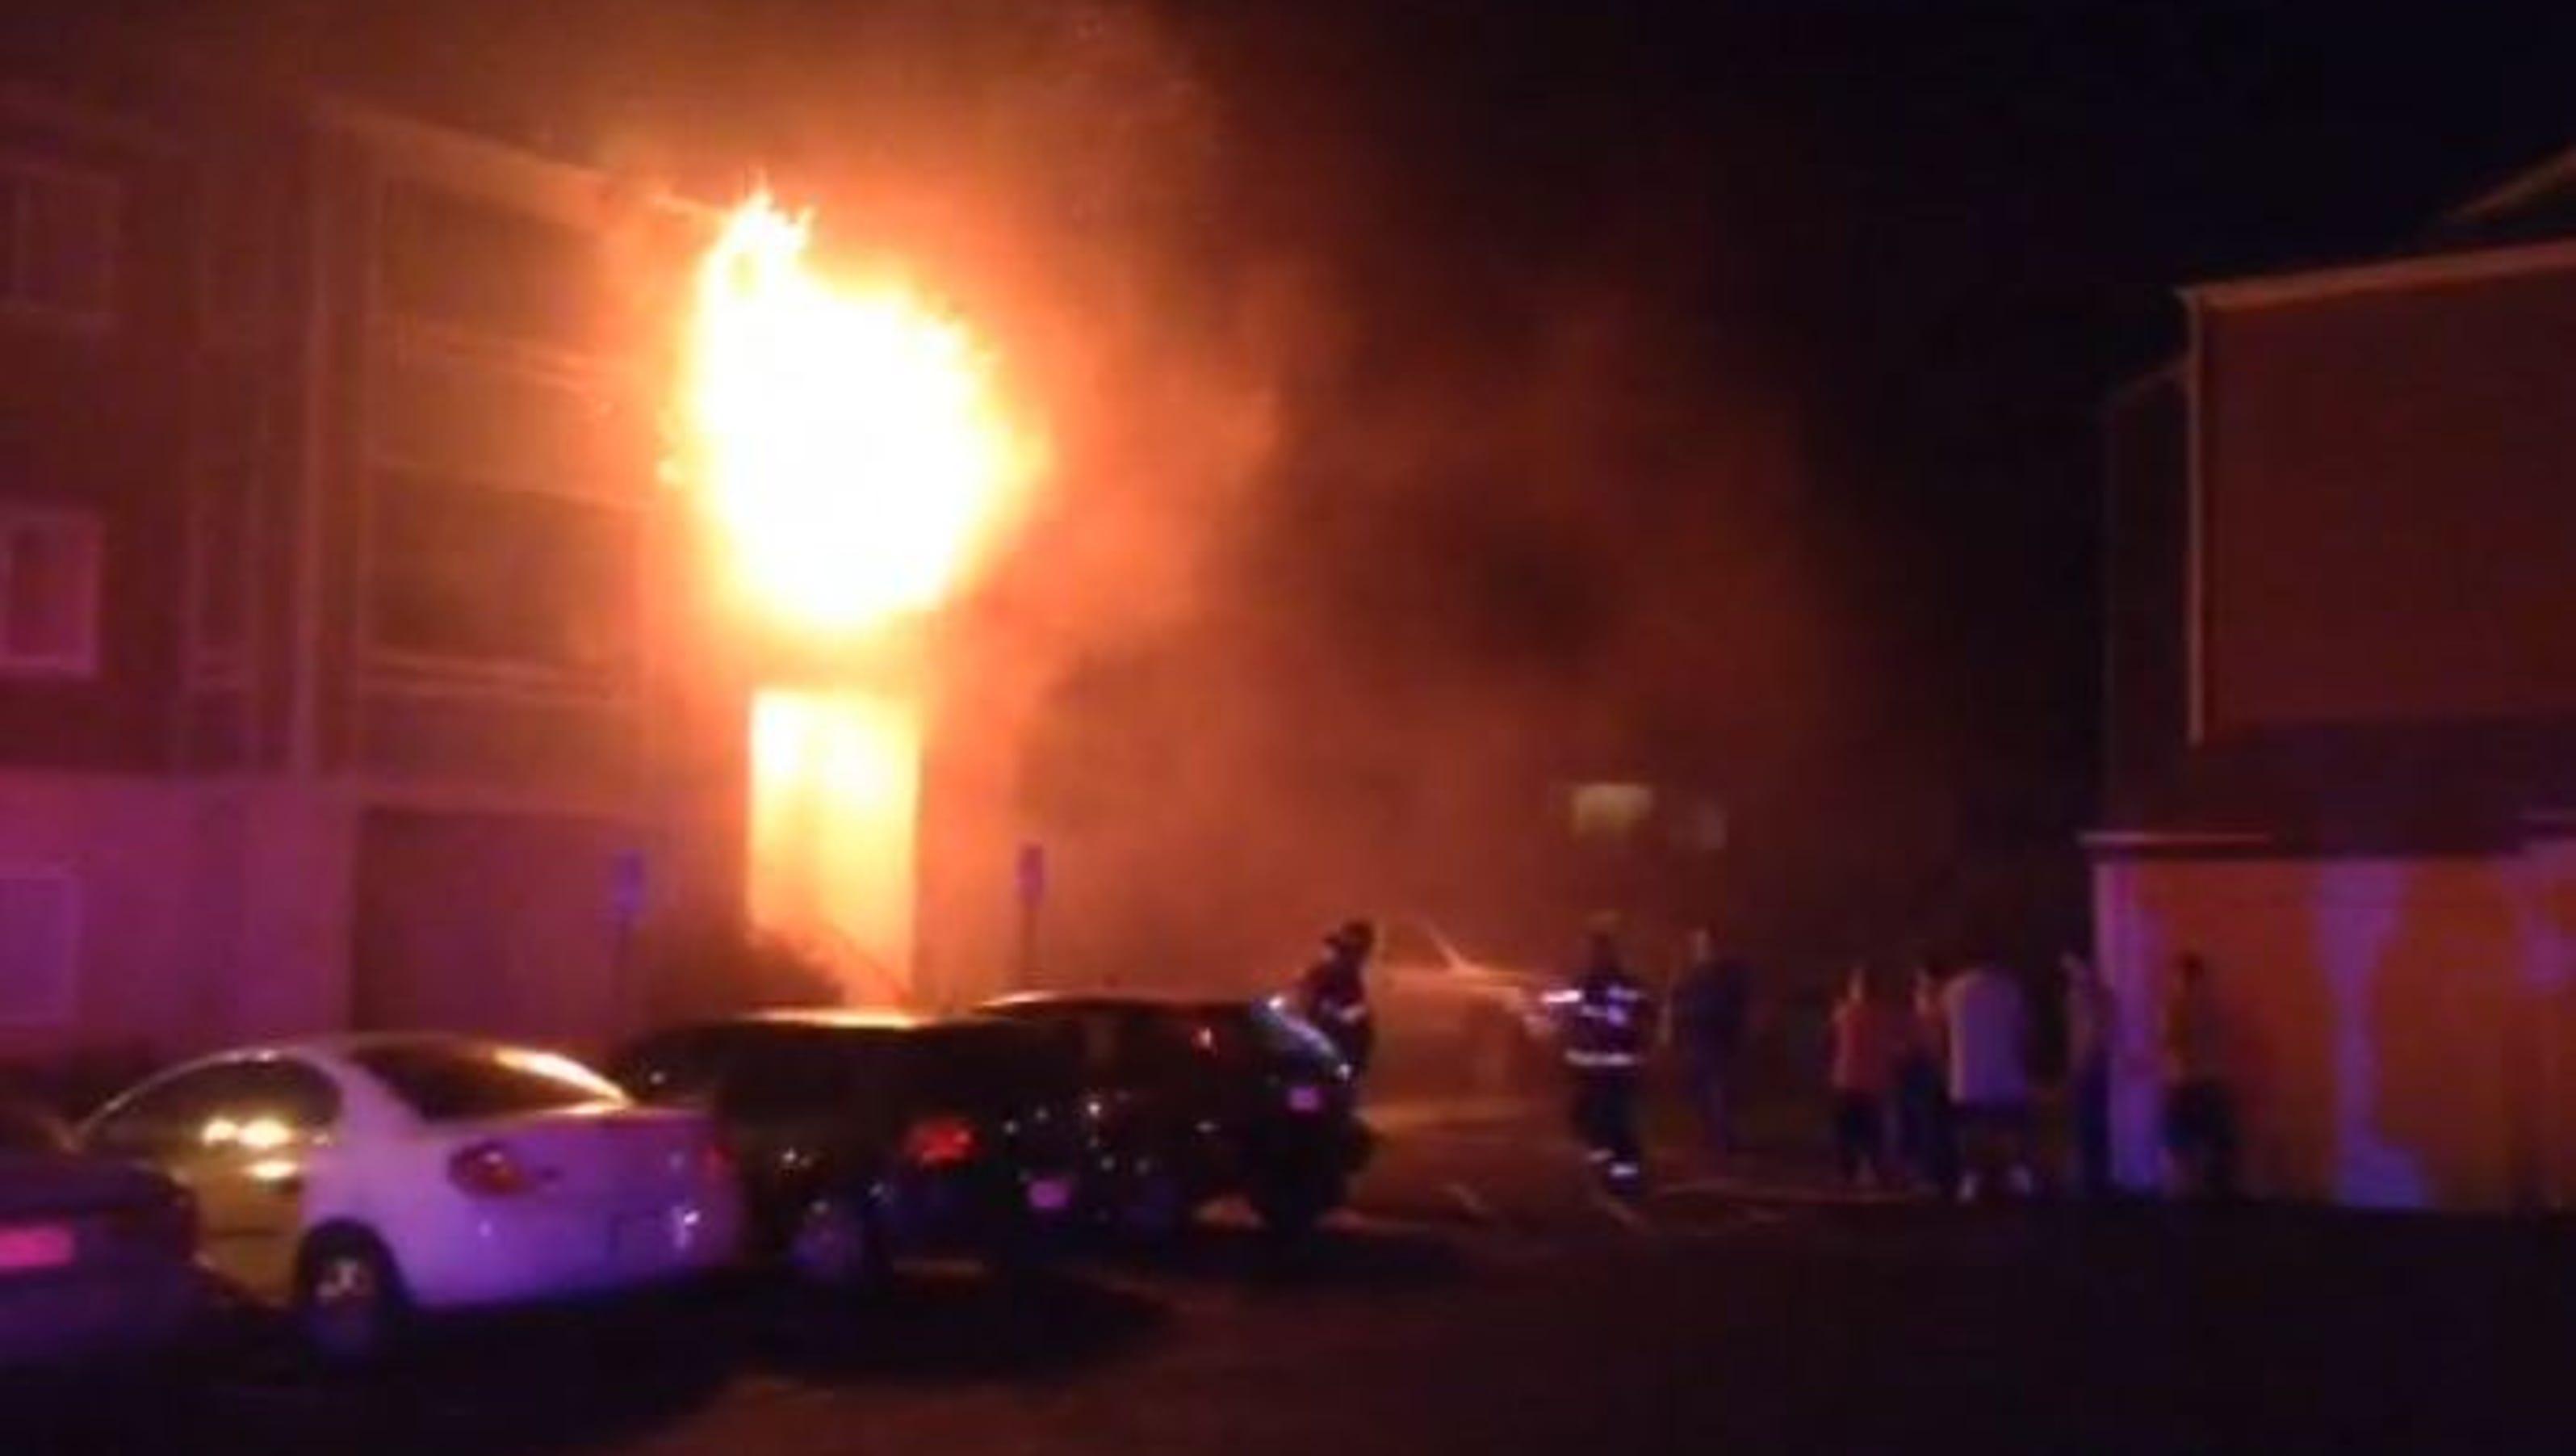 How To Make A Home Fire Escape Plan